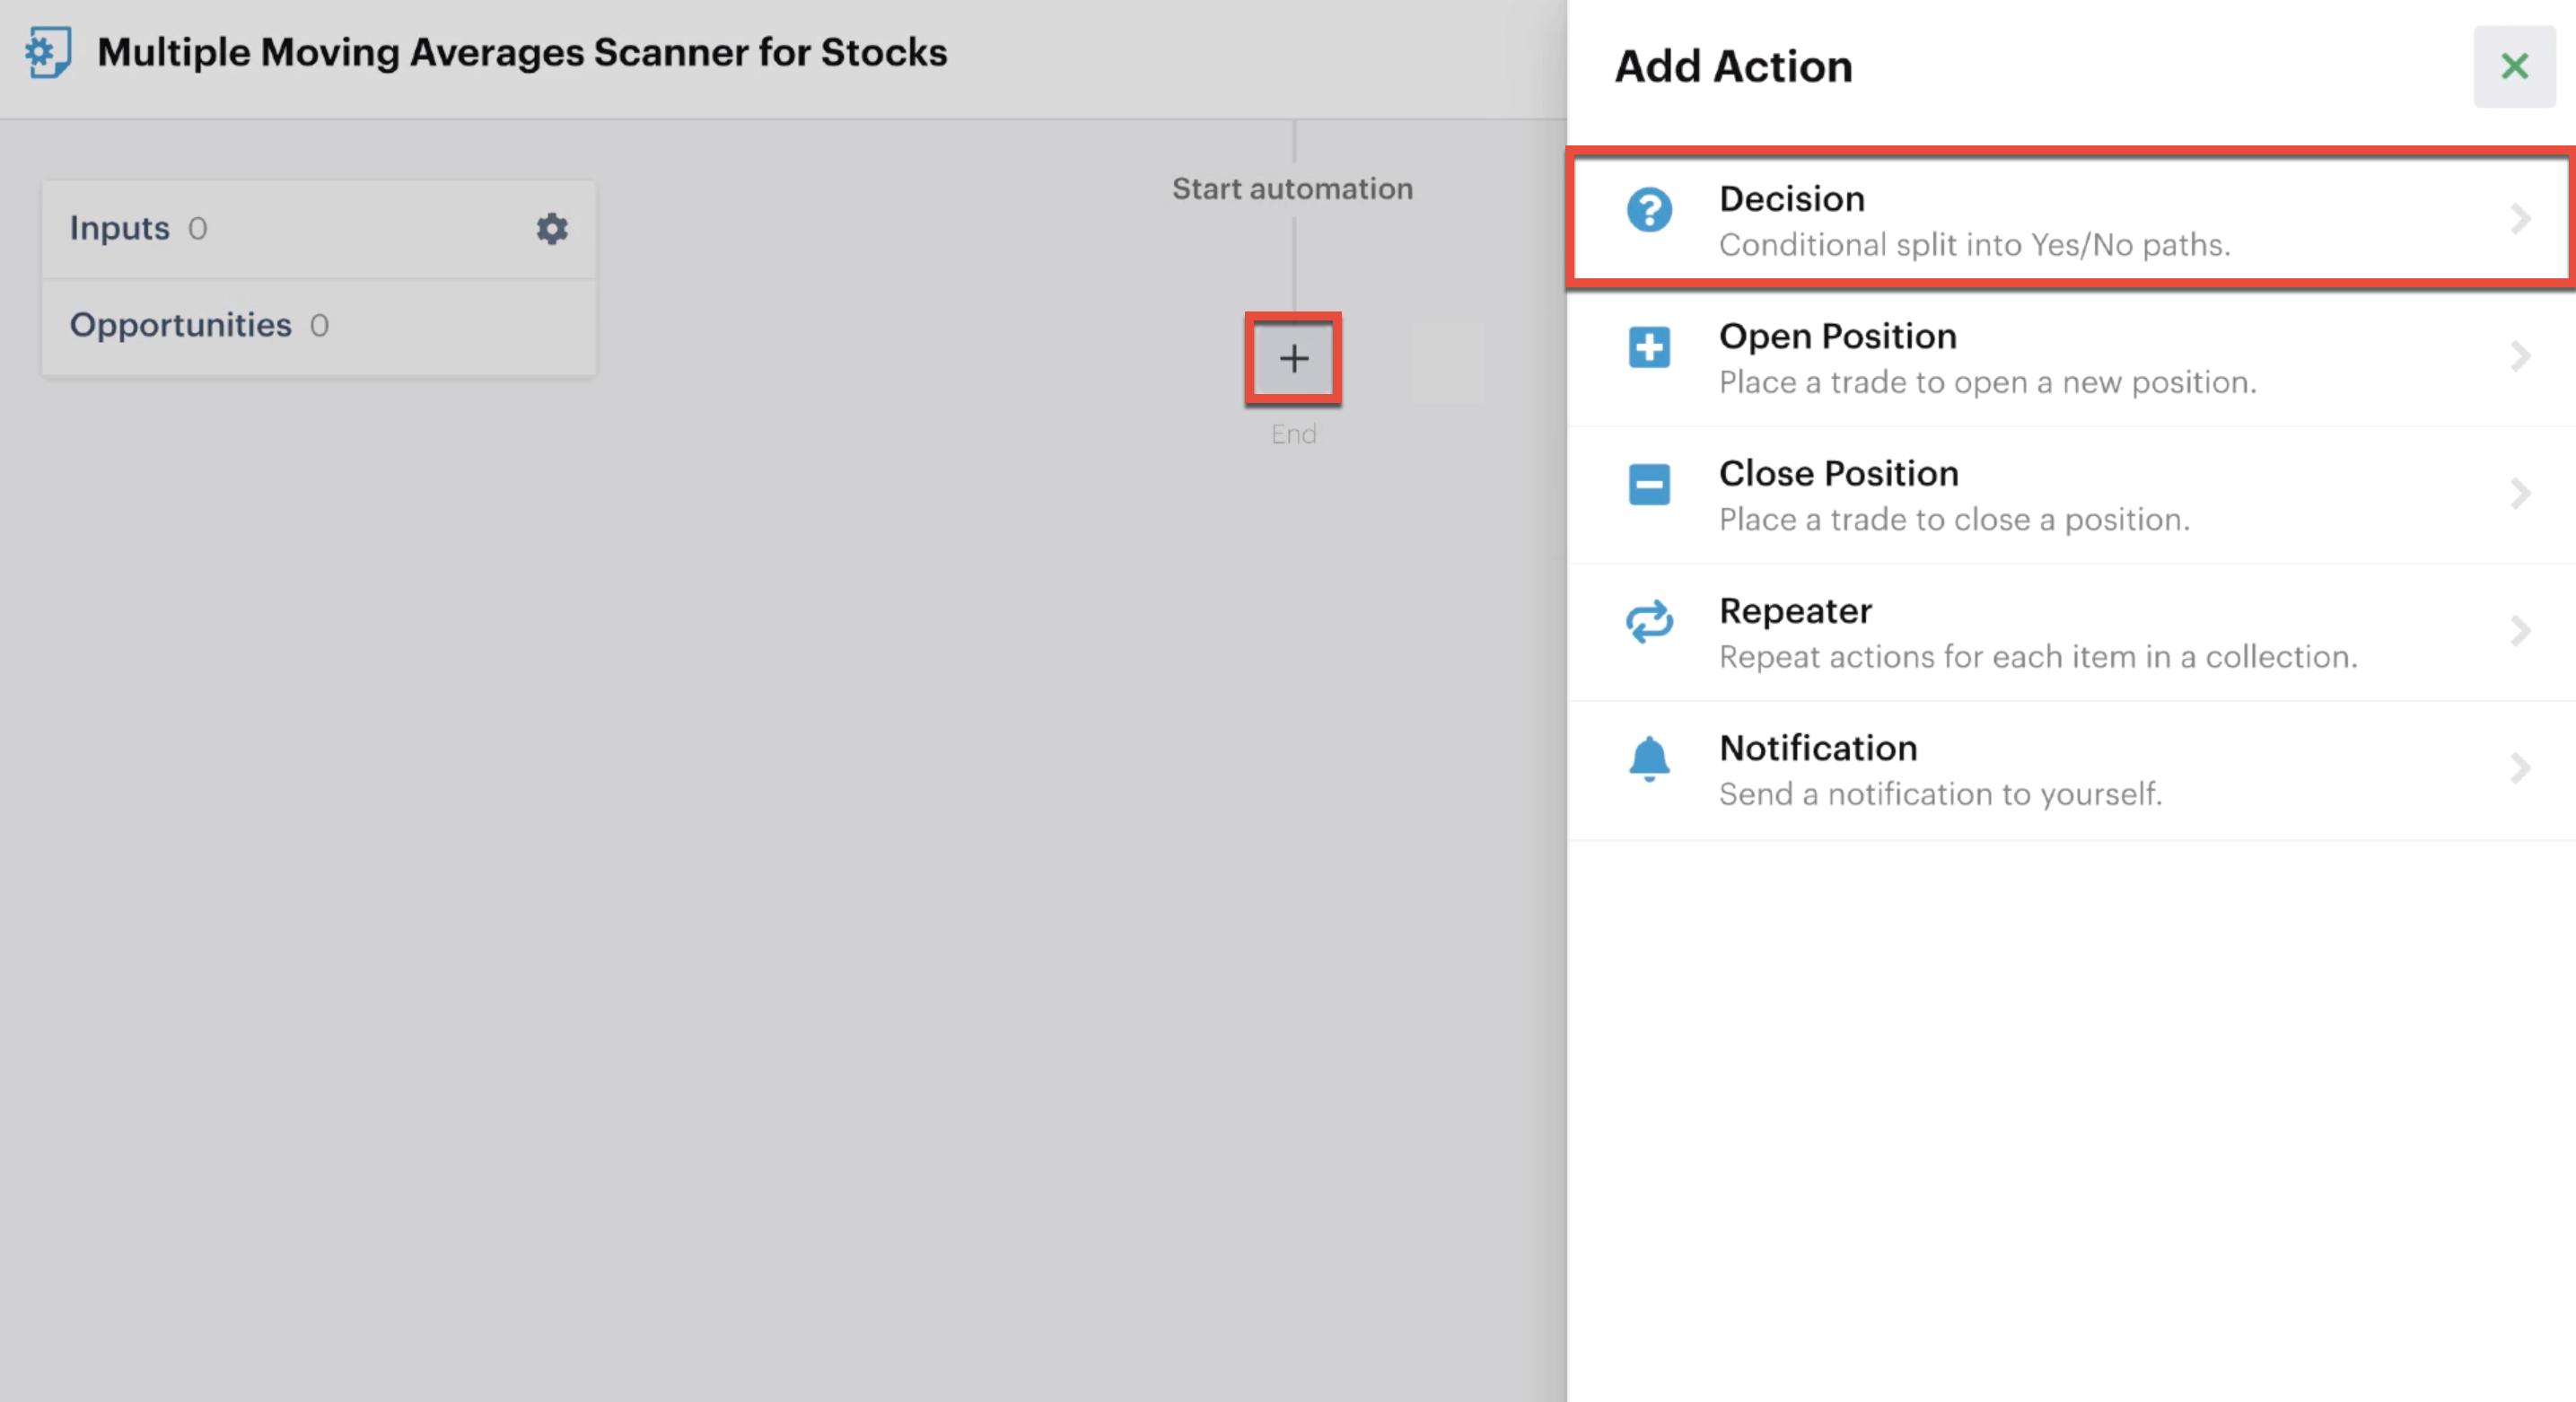 Adding a decision action